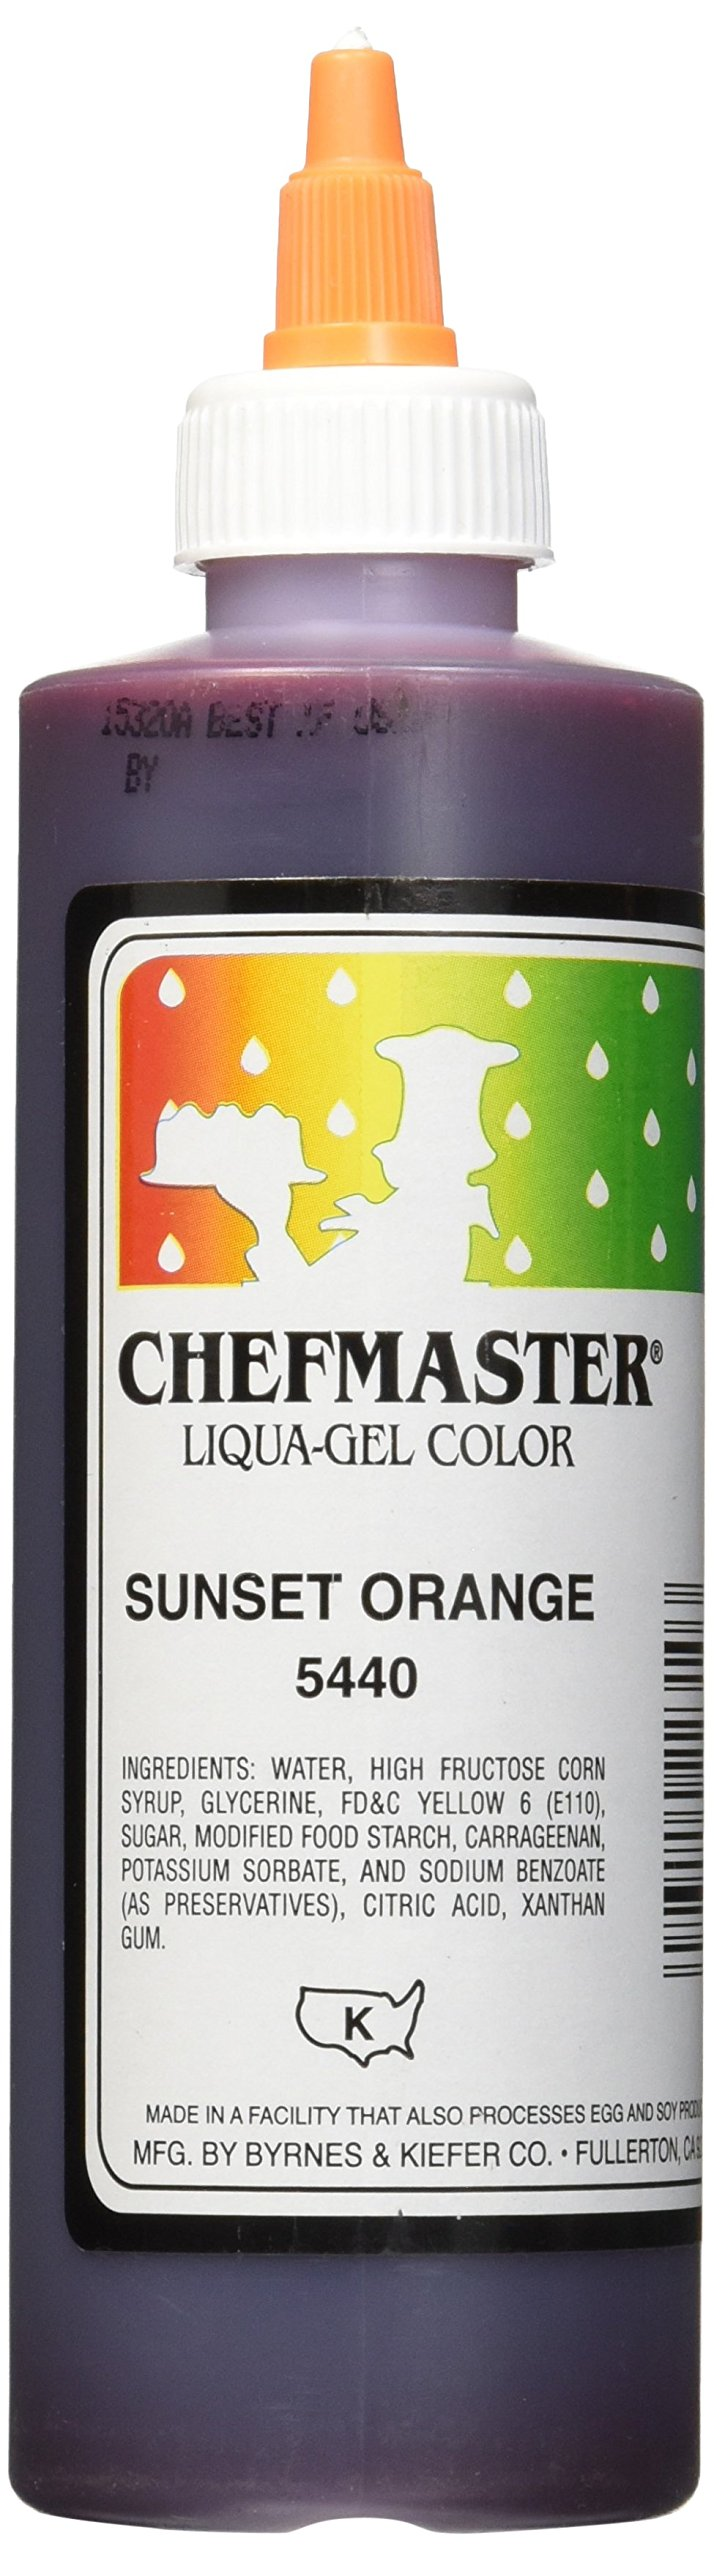 Chefmaster Liqua-Gel Food Color, 10.5-Ounce, Sunset Orange